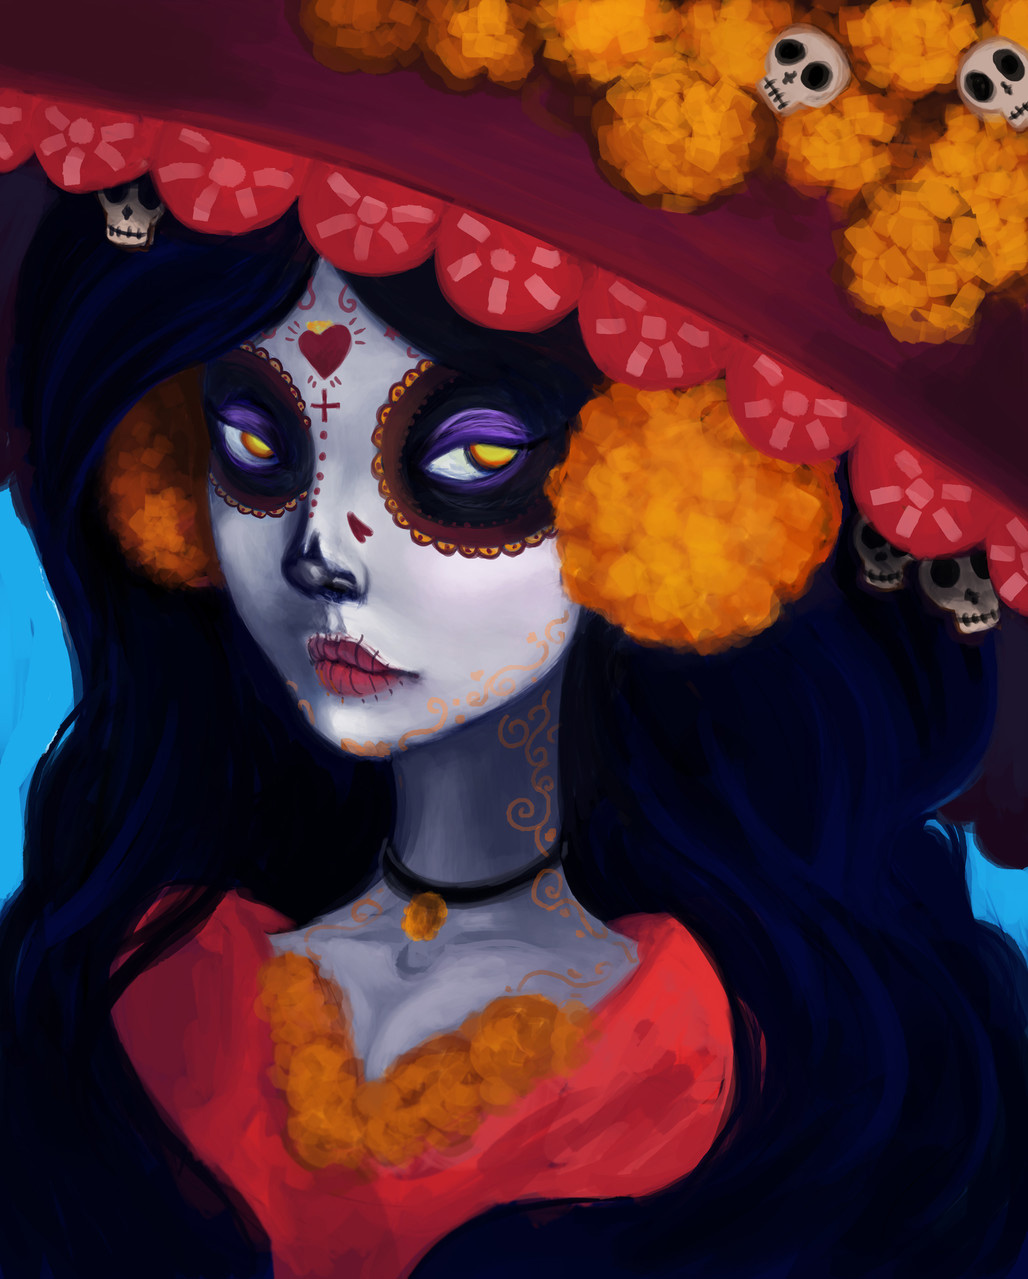 La Muerte (Saint Death) fanart Photoshop painting (2015) by Terea Cantu (IDEA20)